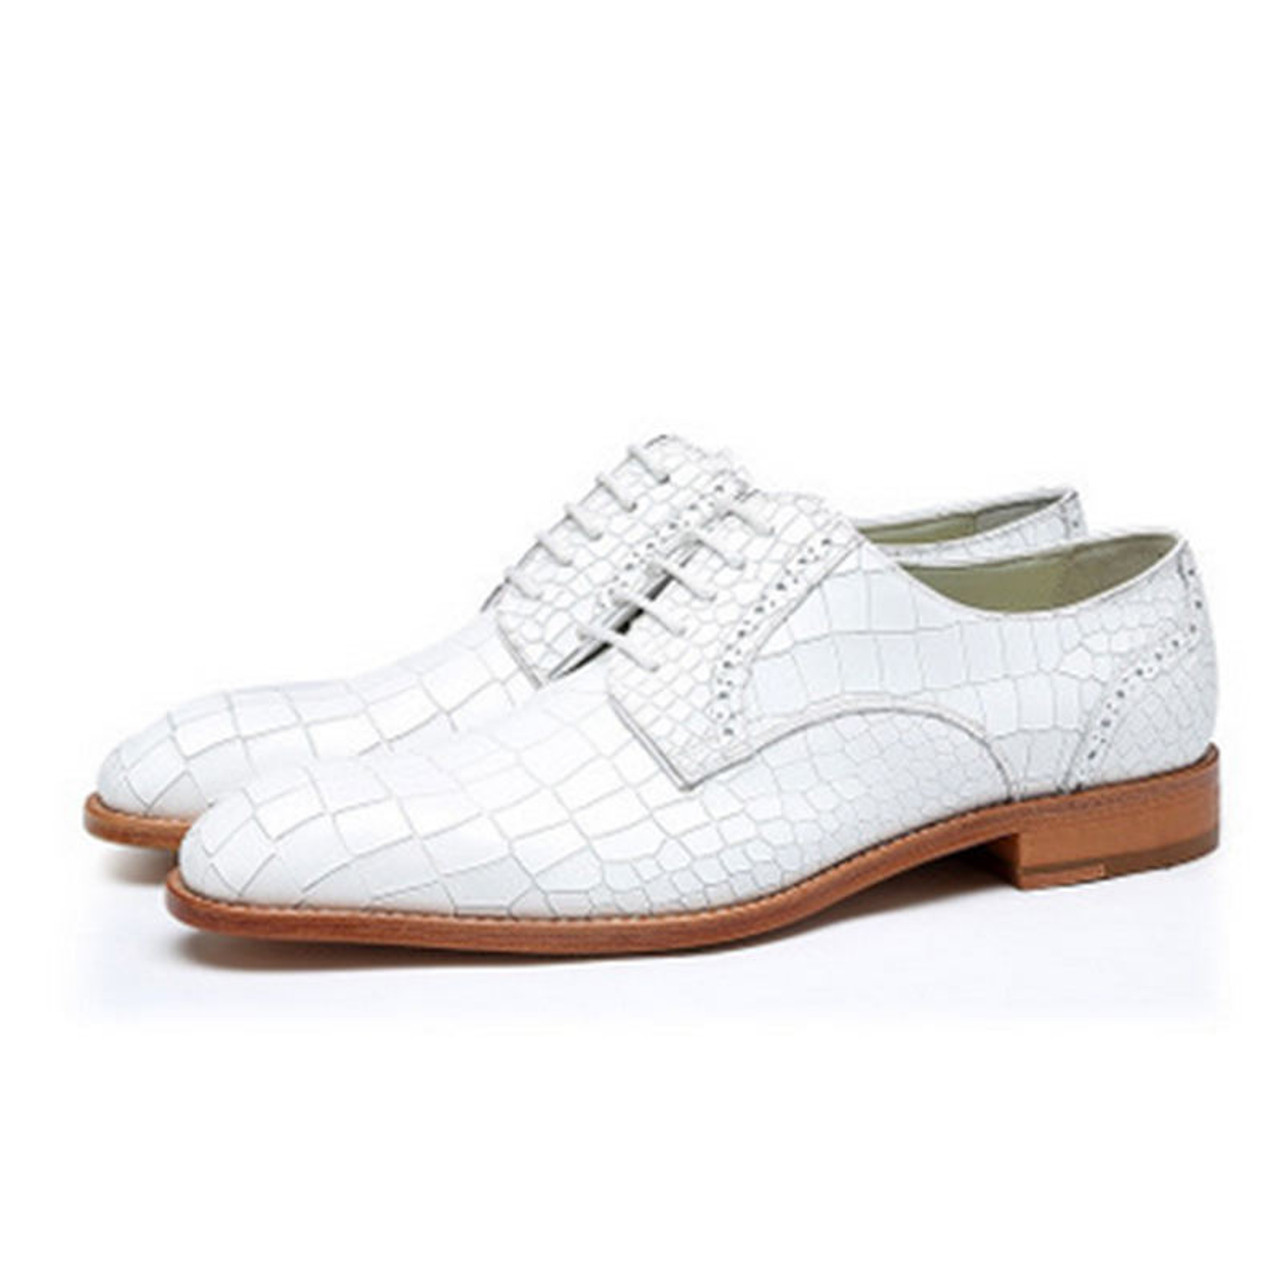 Black And White Crocodile Shoes